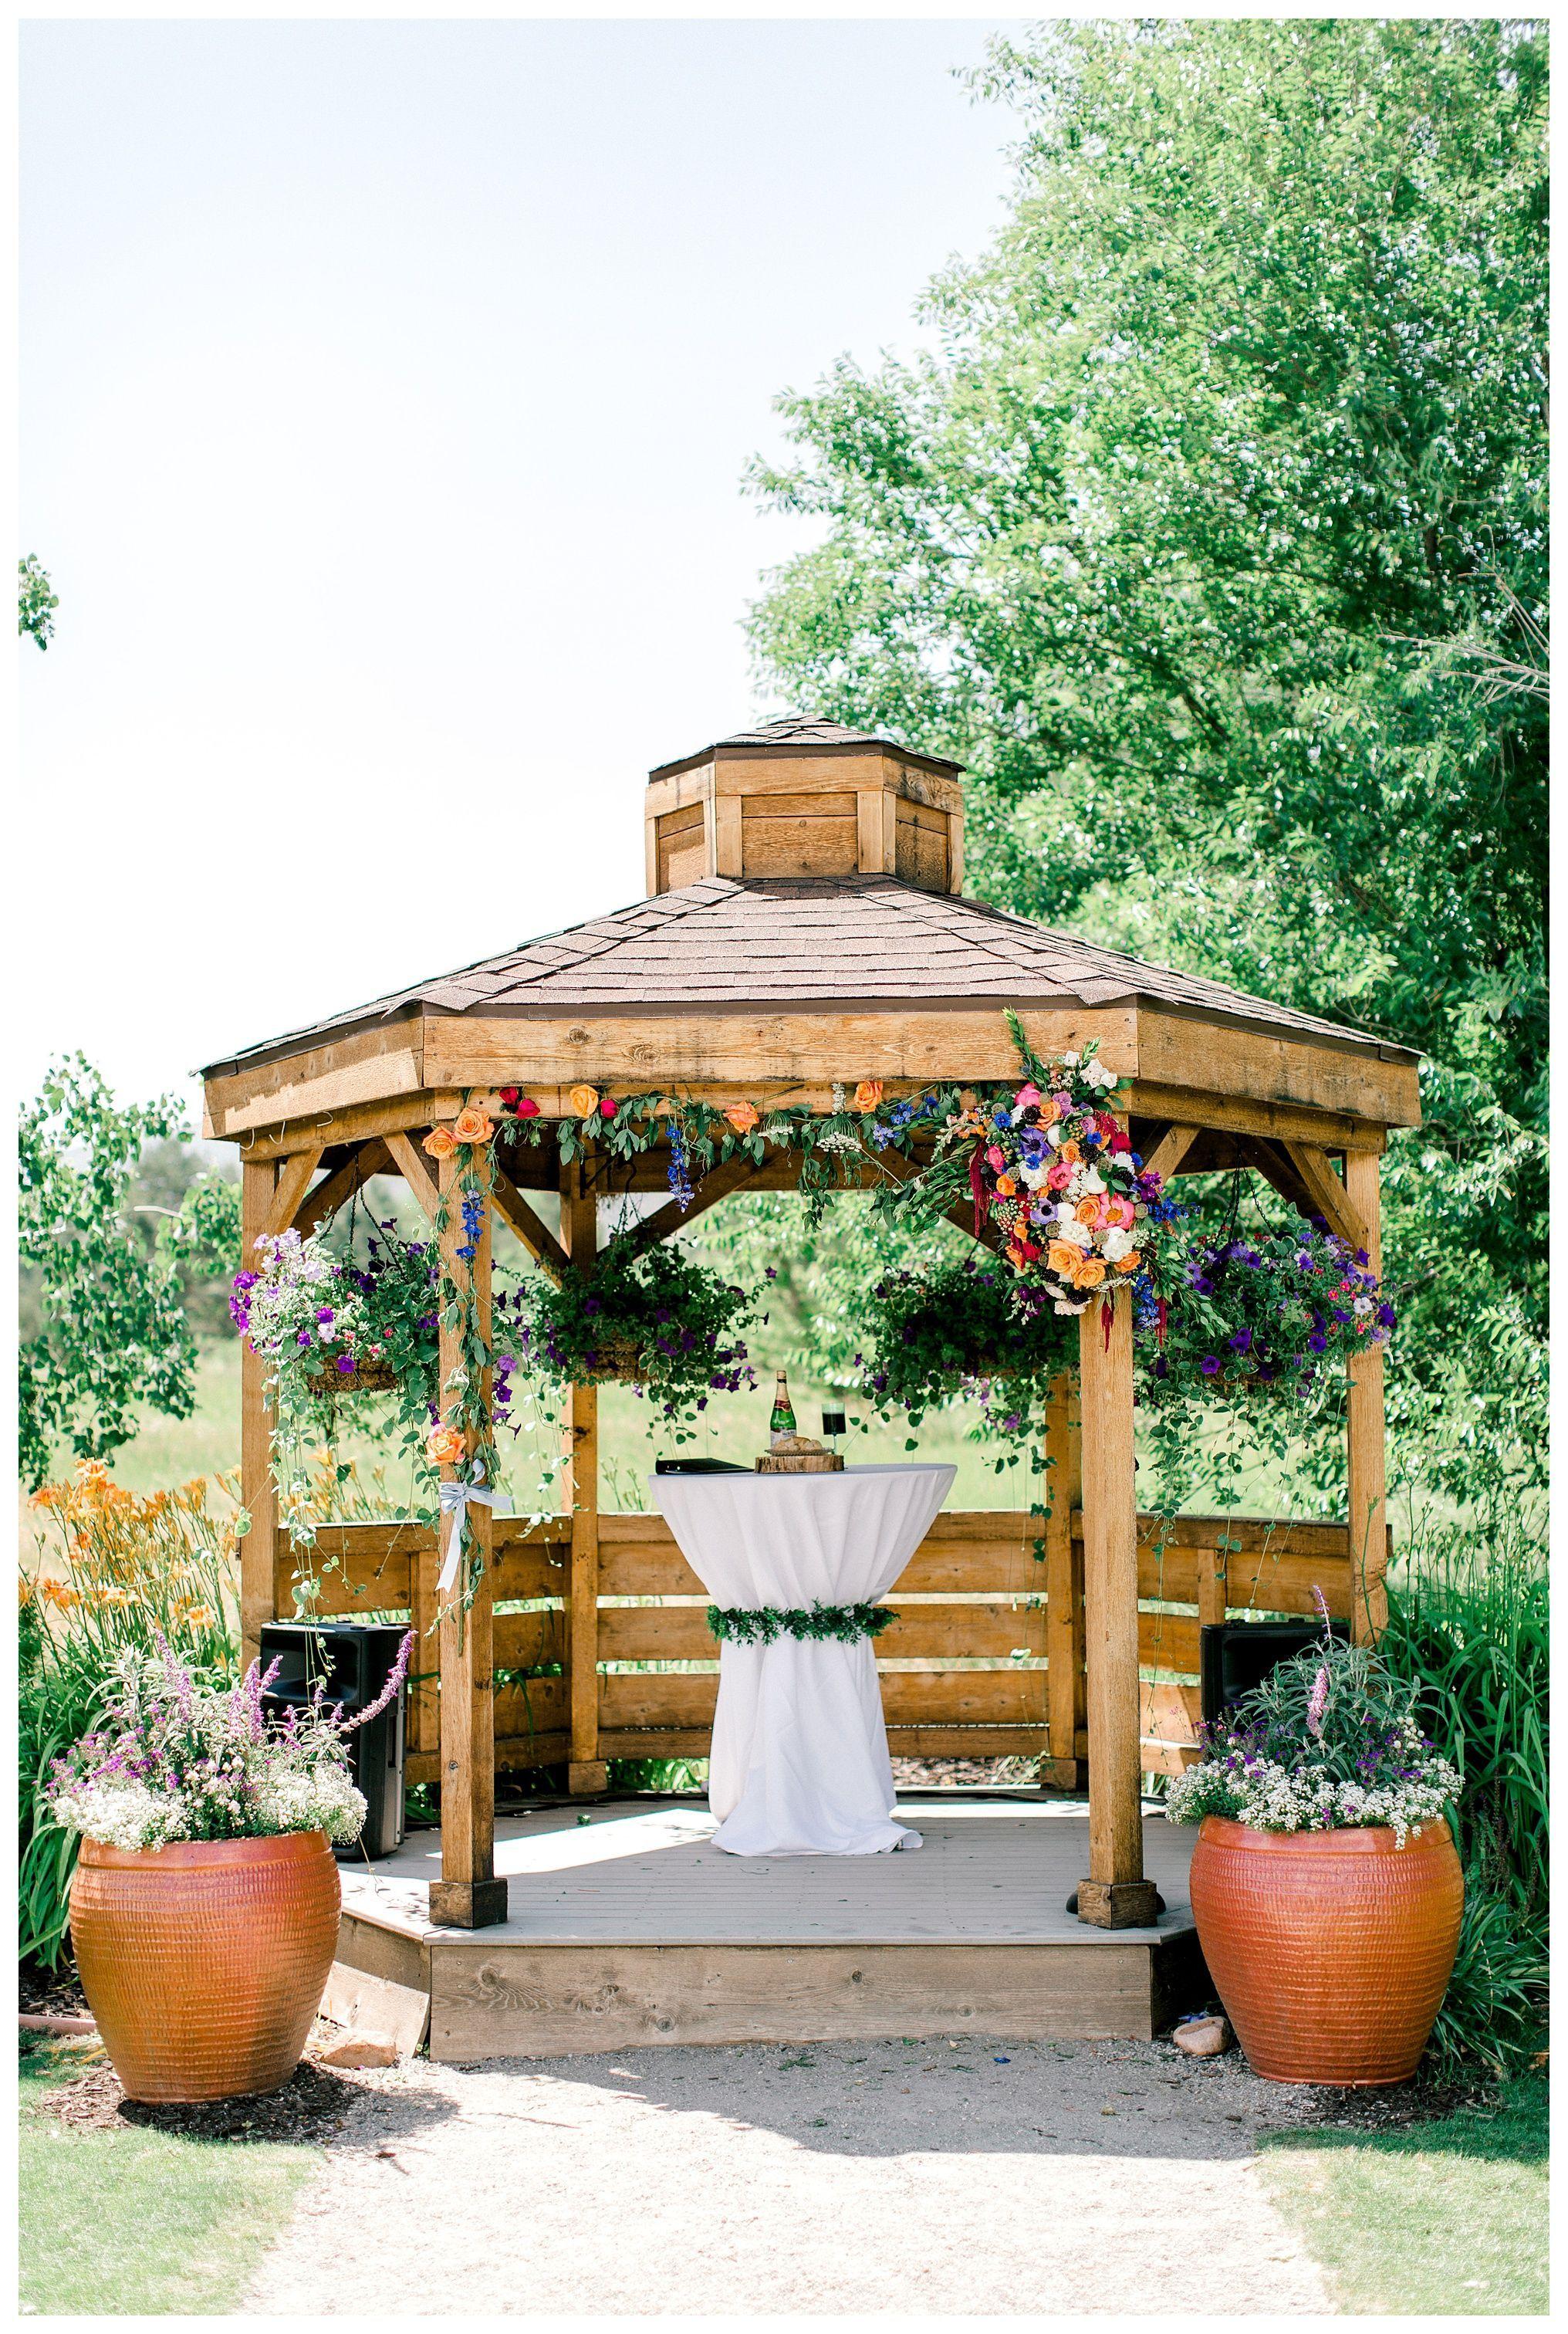 2969cd5716433cf9038968d69a67cf08 - Denver Botanic Gardens Chatfield Farms Wedding